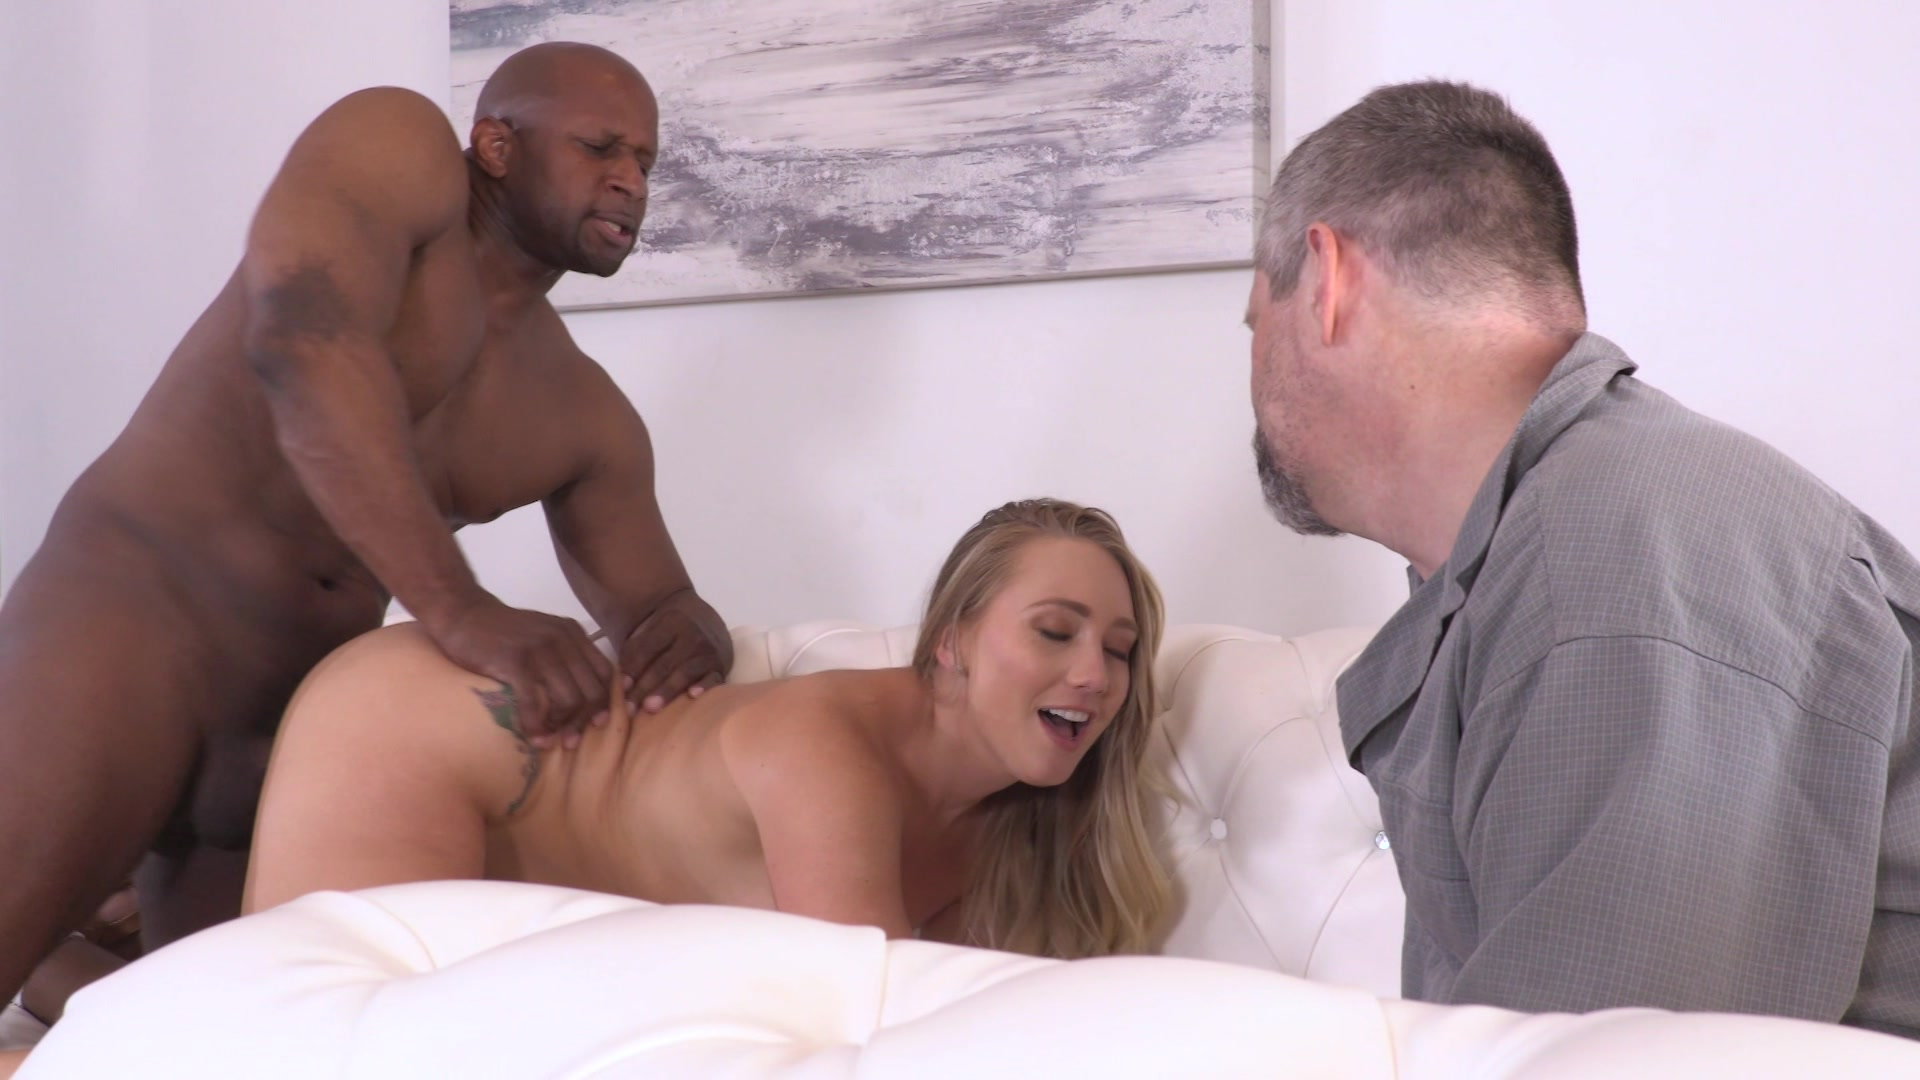 Miltf scene 5 big latina boob